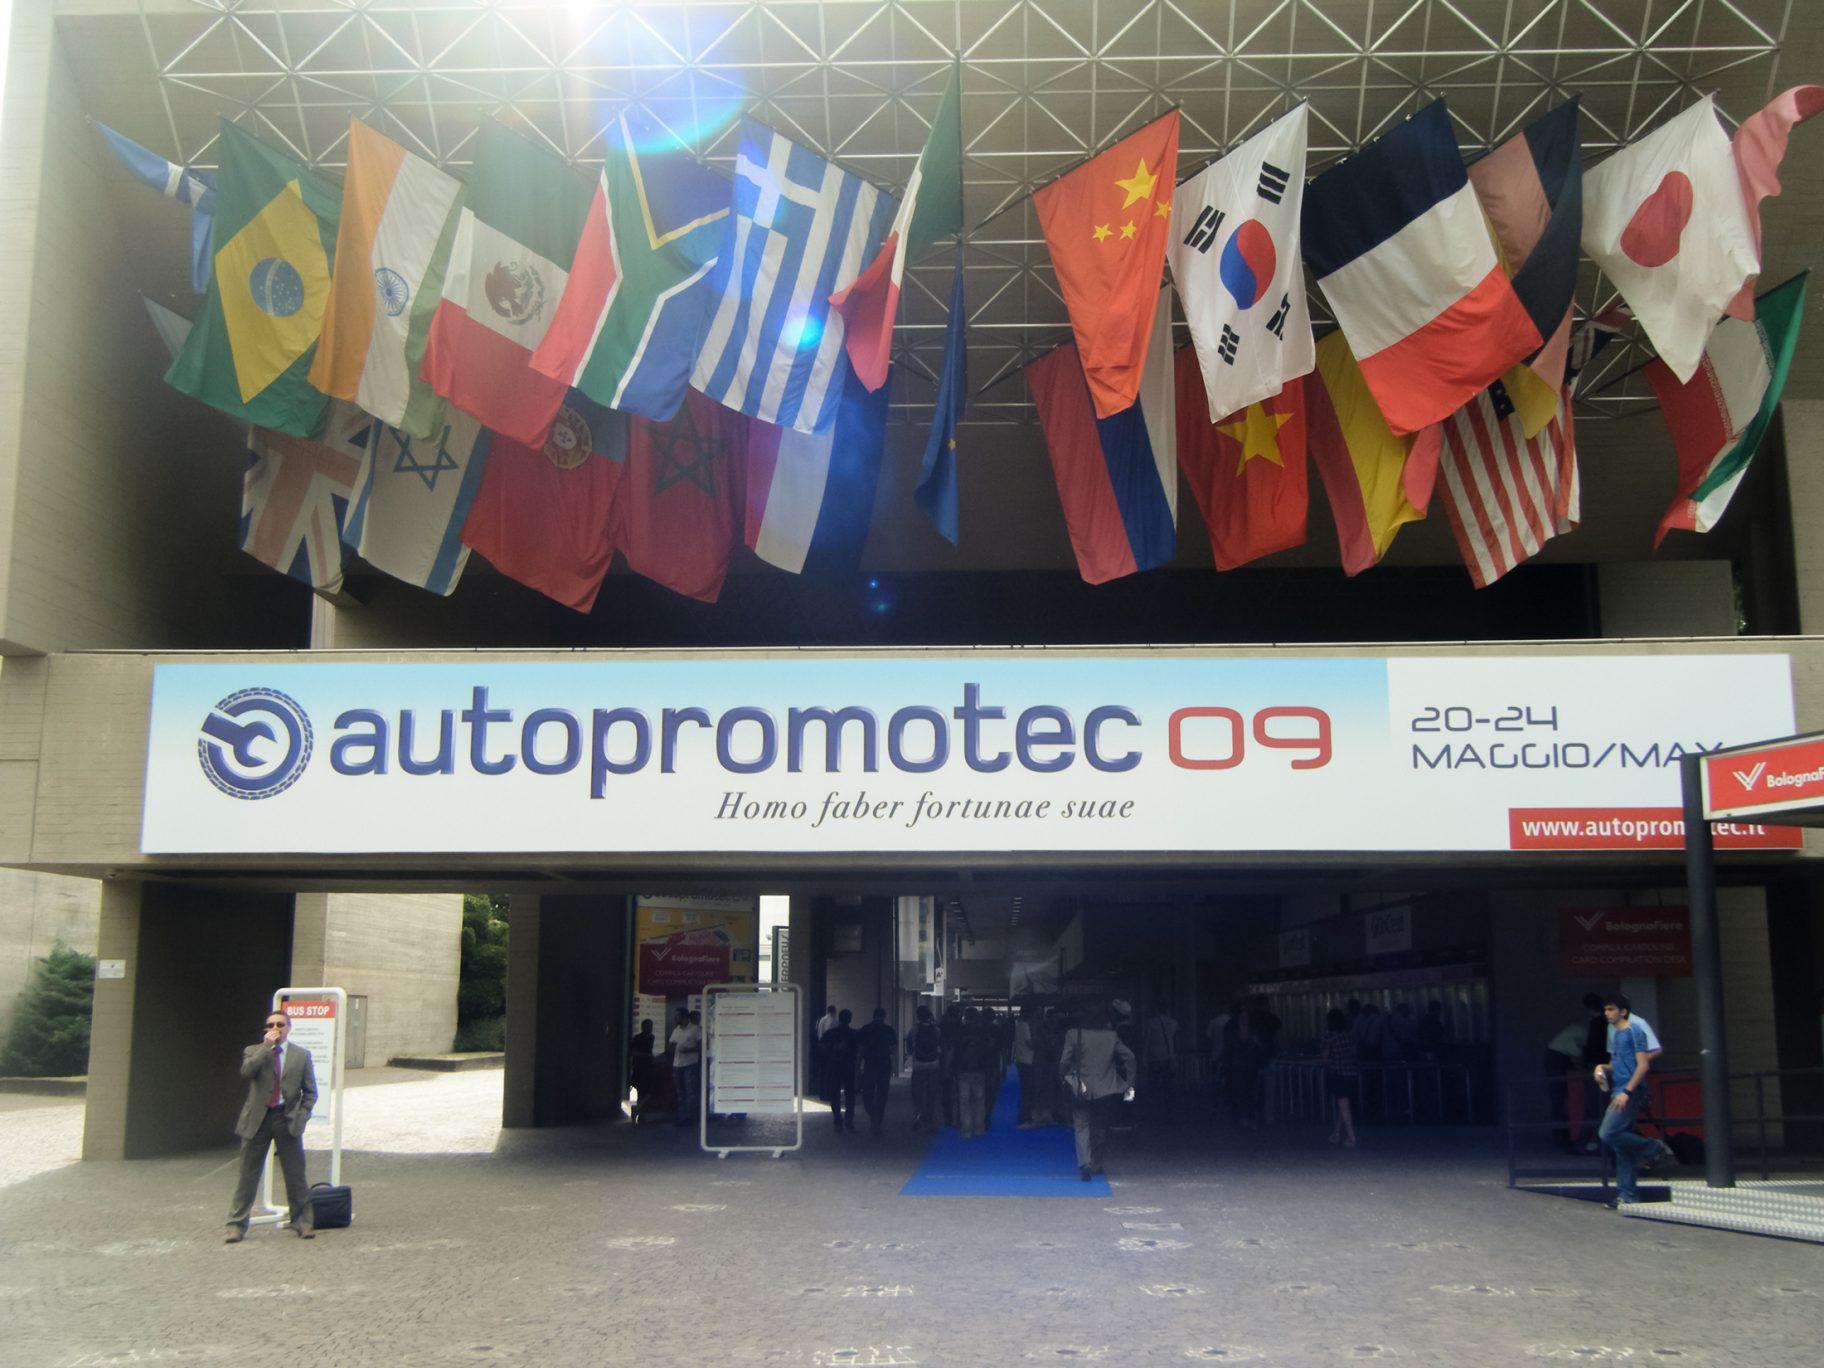 Autopromotec-fiera-2009-Entrata 02